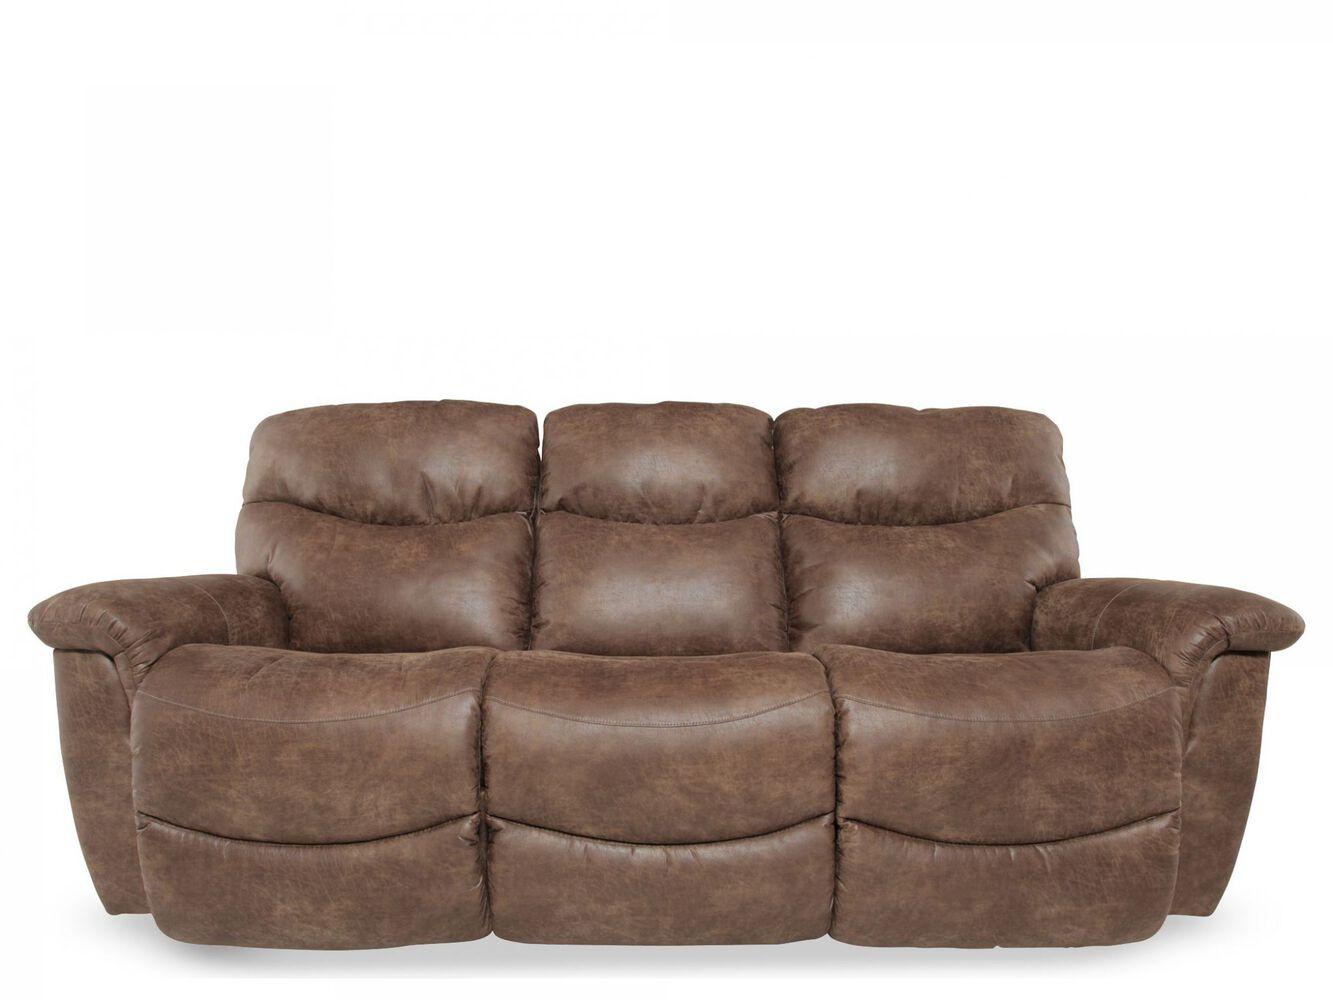 lazy boy james sofa la z boy james 3 piece reclining. Black Bedroom Furniture Sets. Home Design Ideas